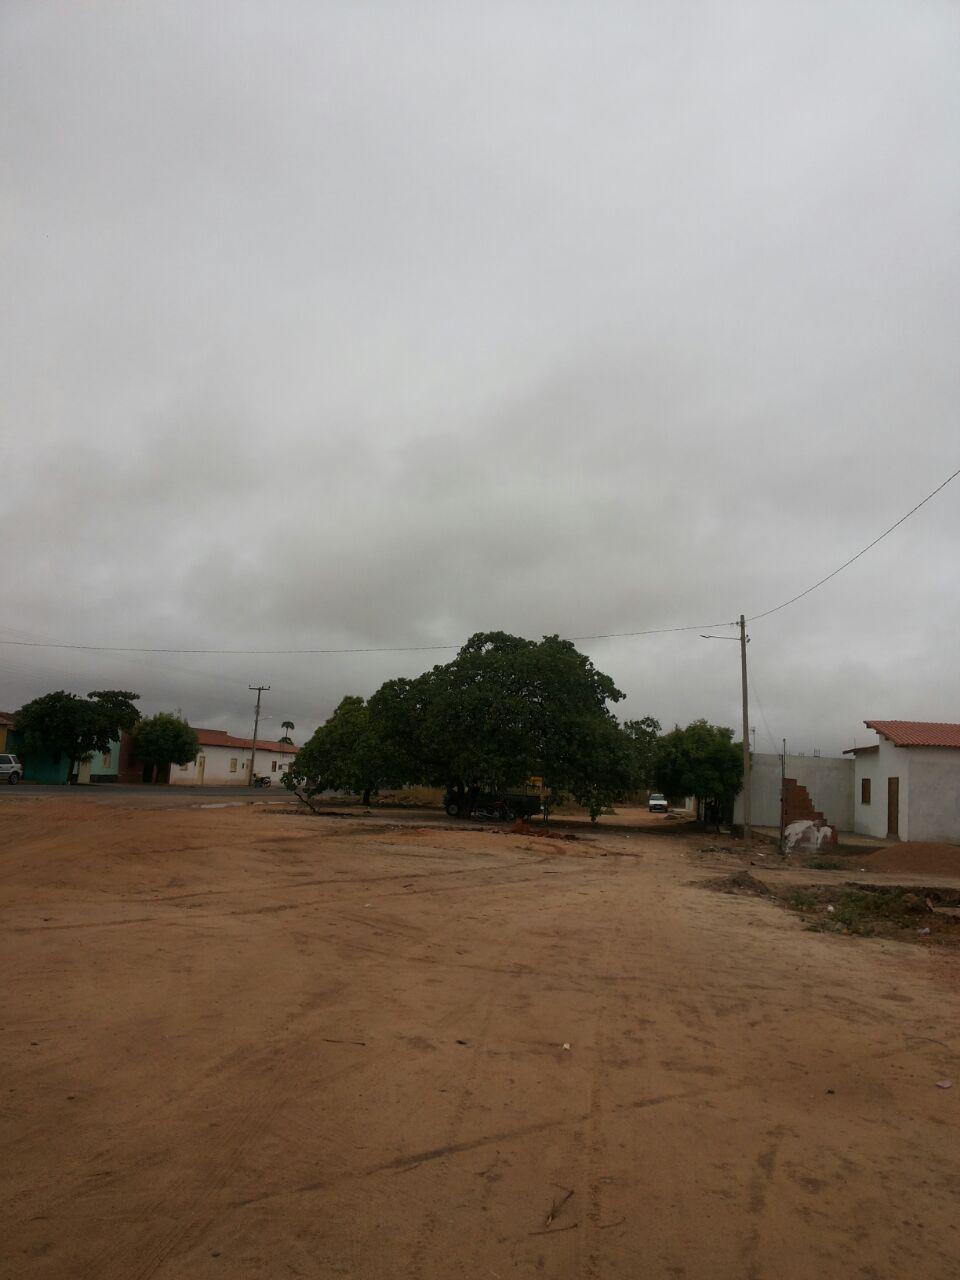 Campo Grande do Piauí - por Edson Oscar